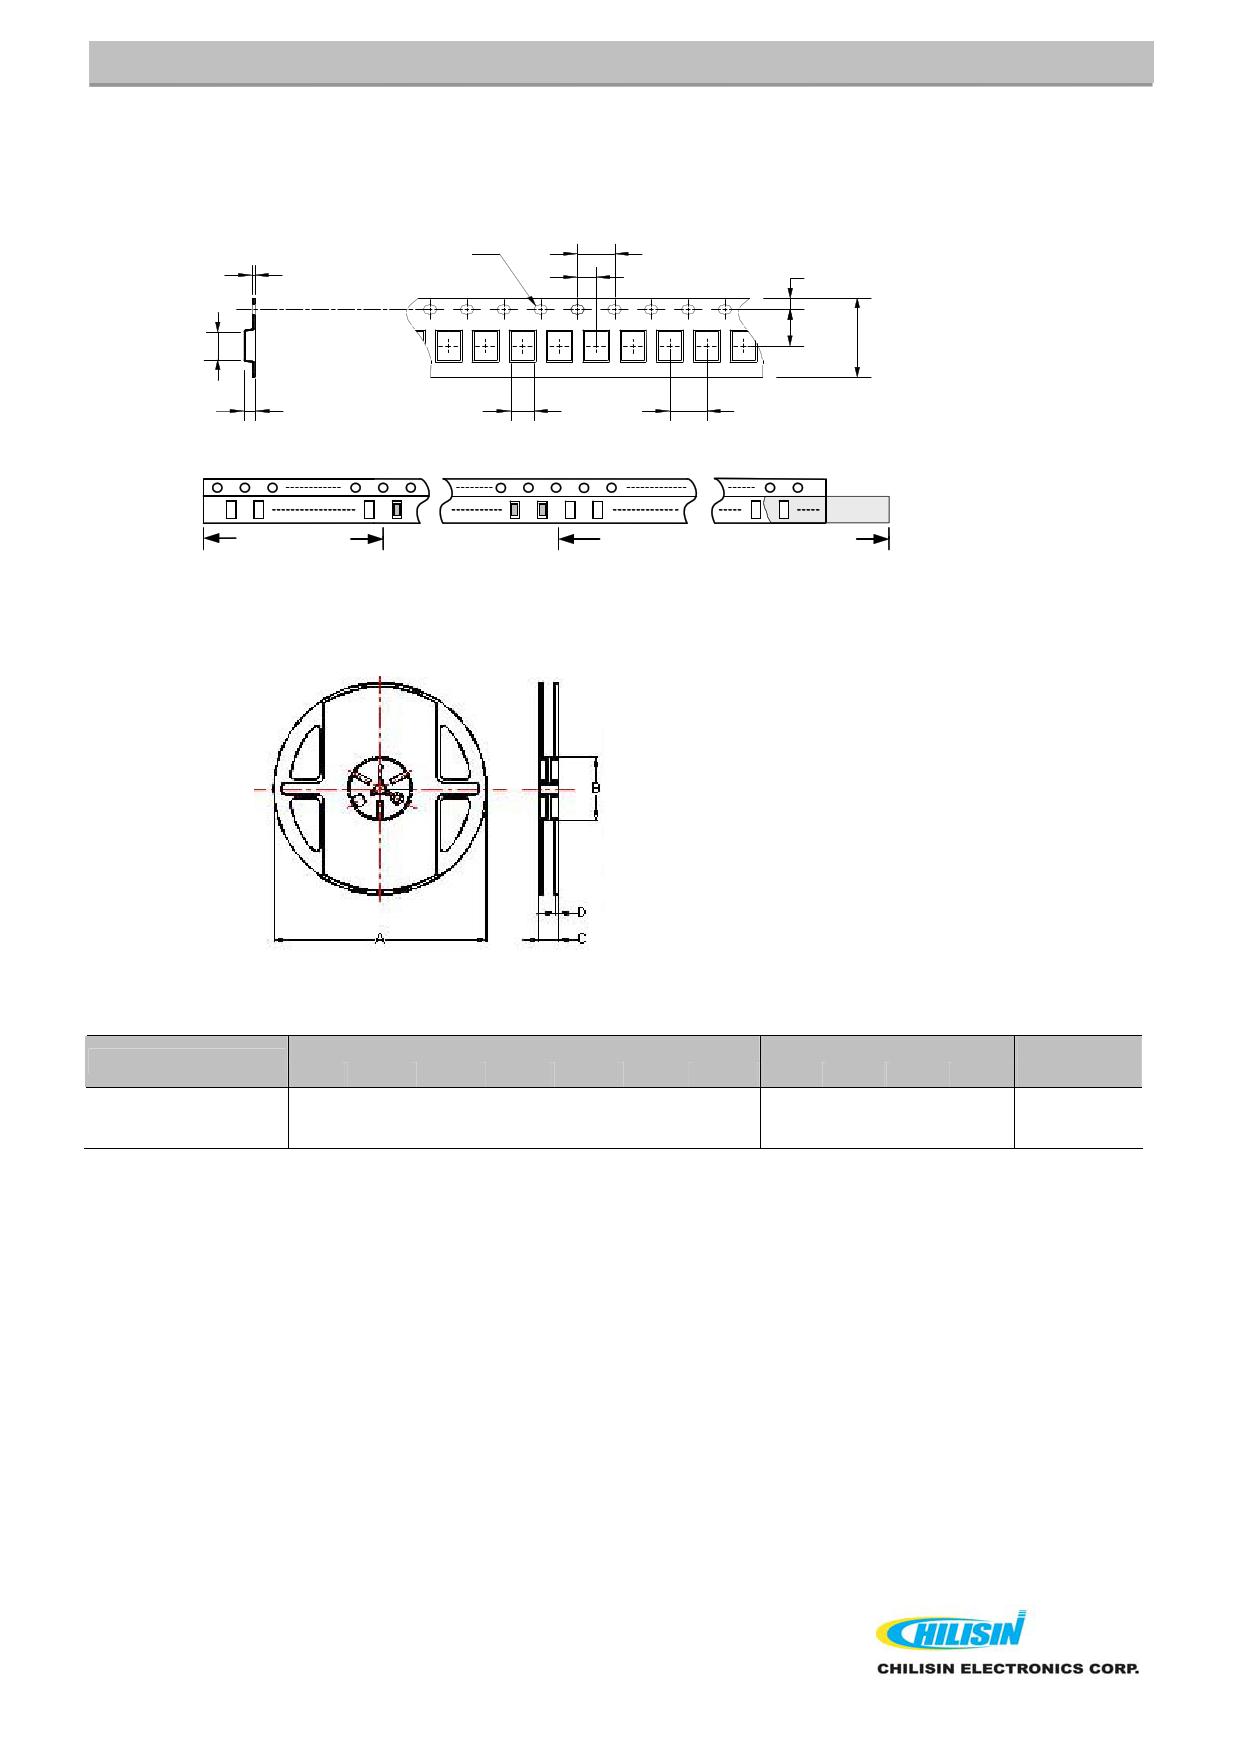 NLC252018T pdf, 반도체, 판매, 대치품